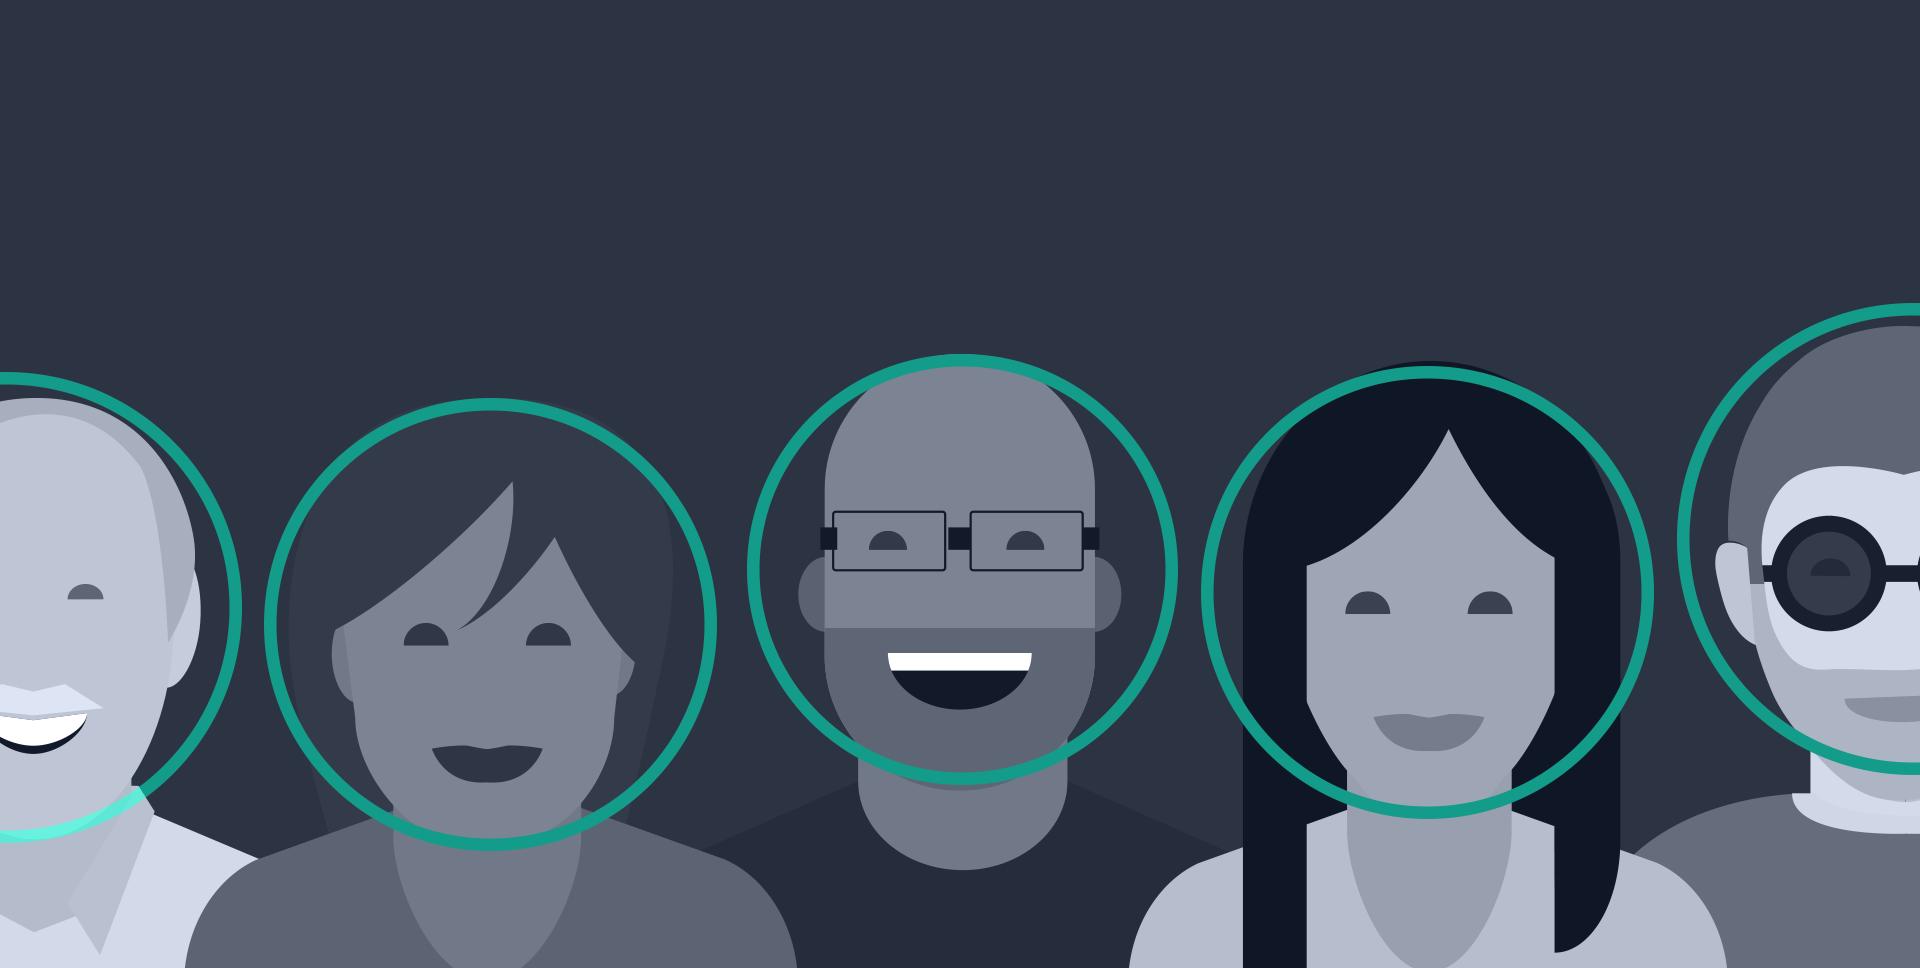 a crowd of cartoon faces with a circle around their faces denoting facial detection